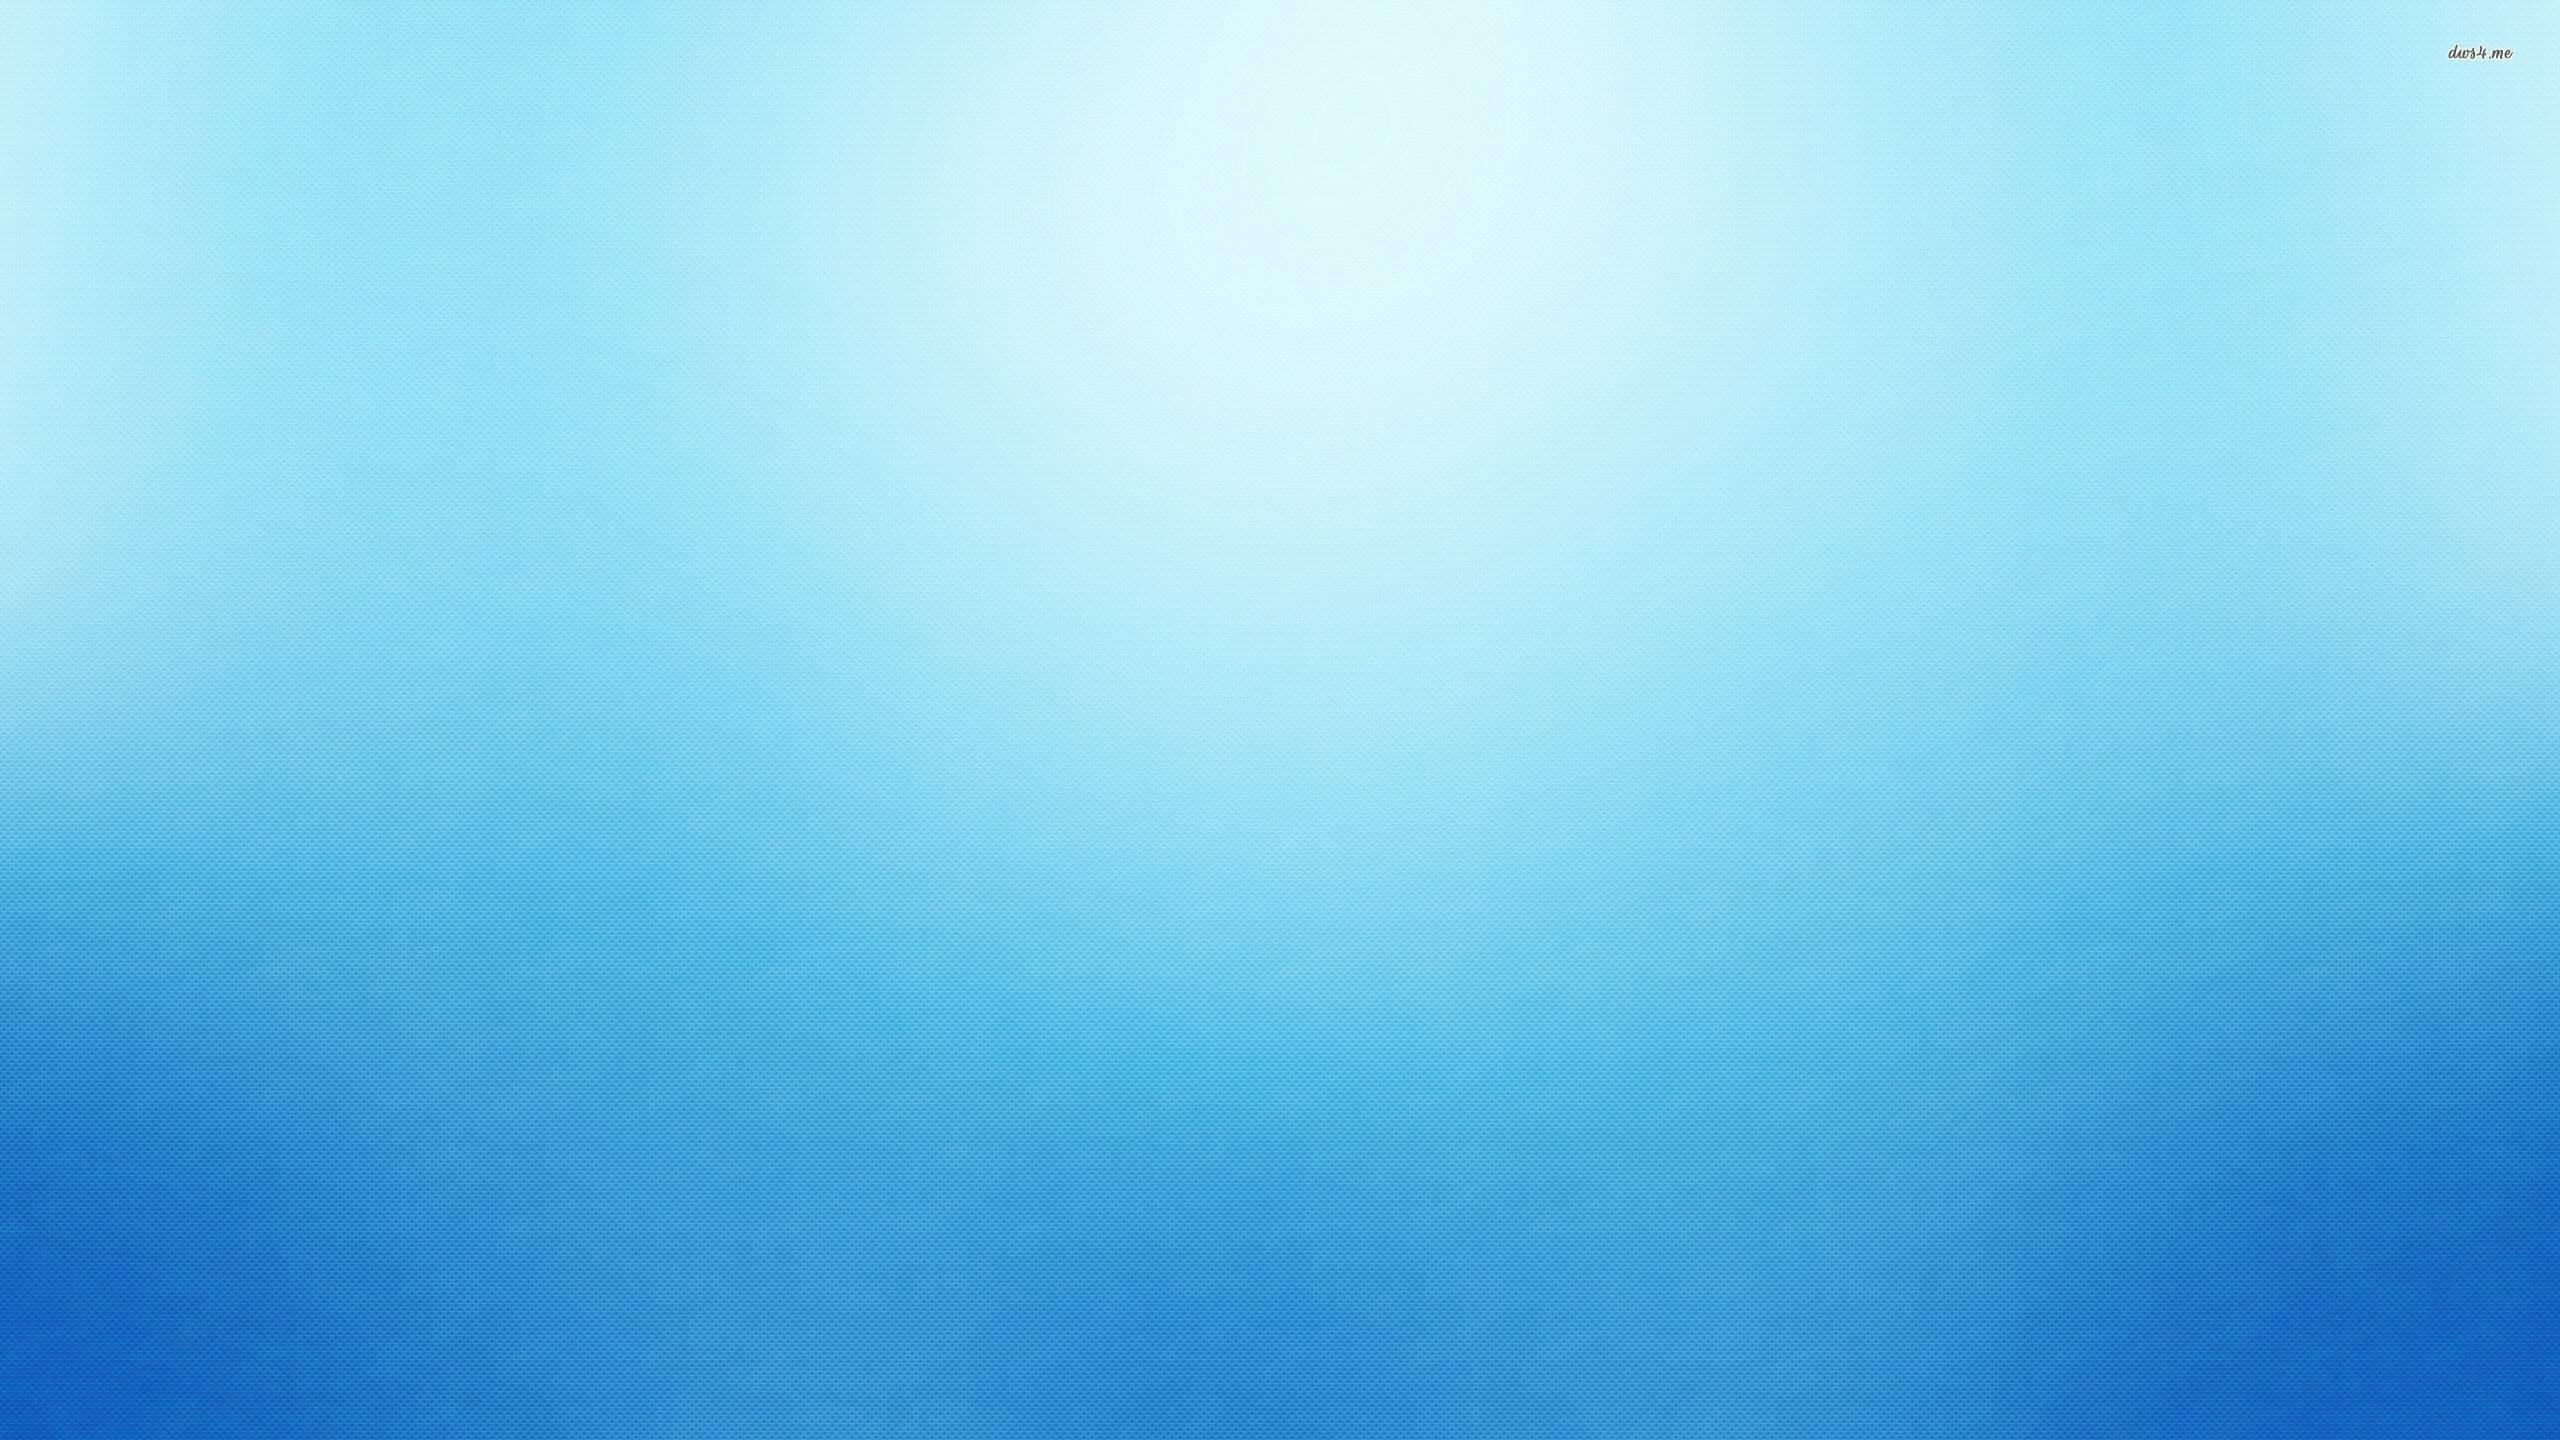 Light Blue Backgrounds ·①